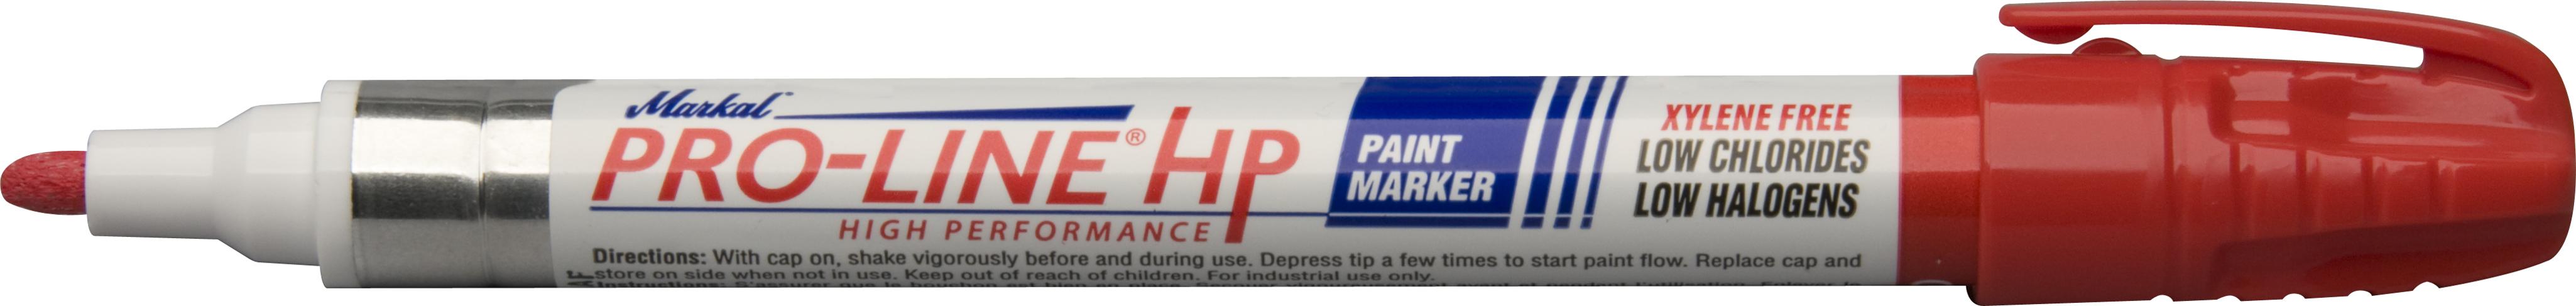 Markal Pro Line HP Paint Marker - Orange